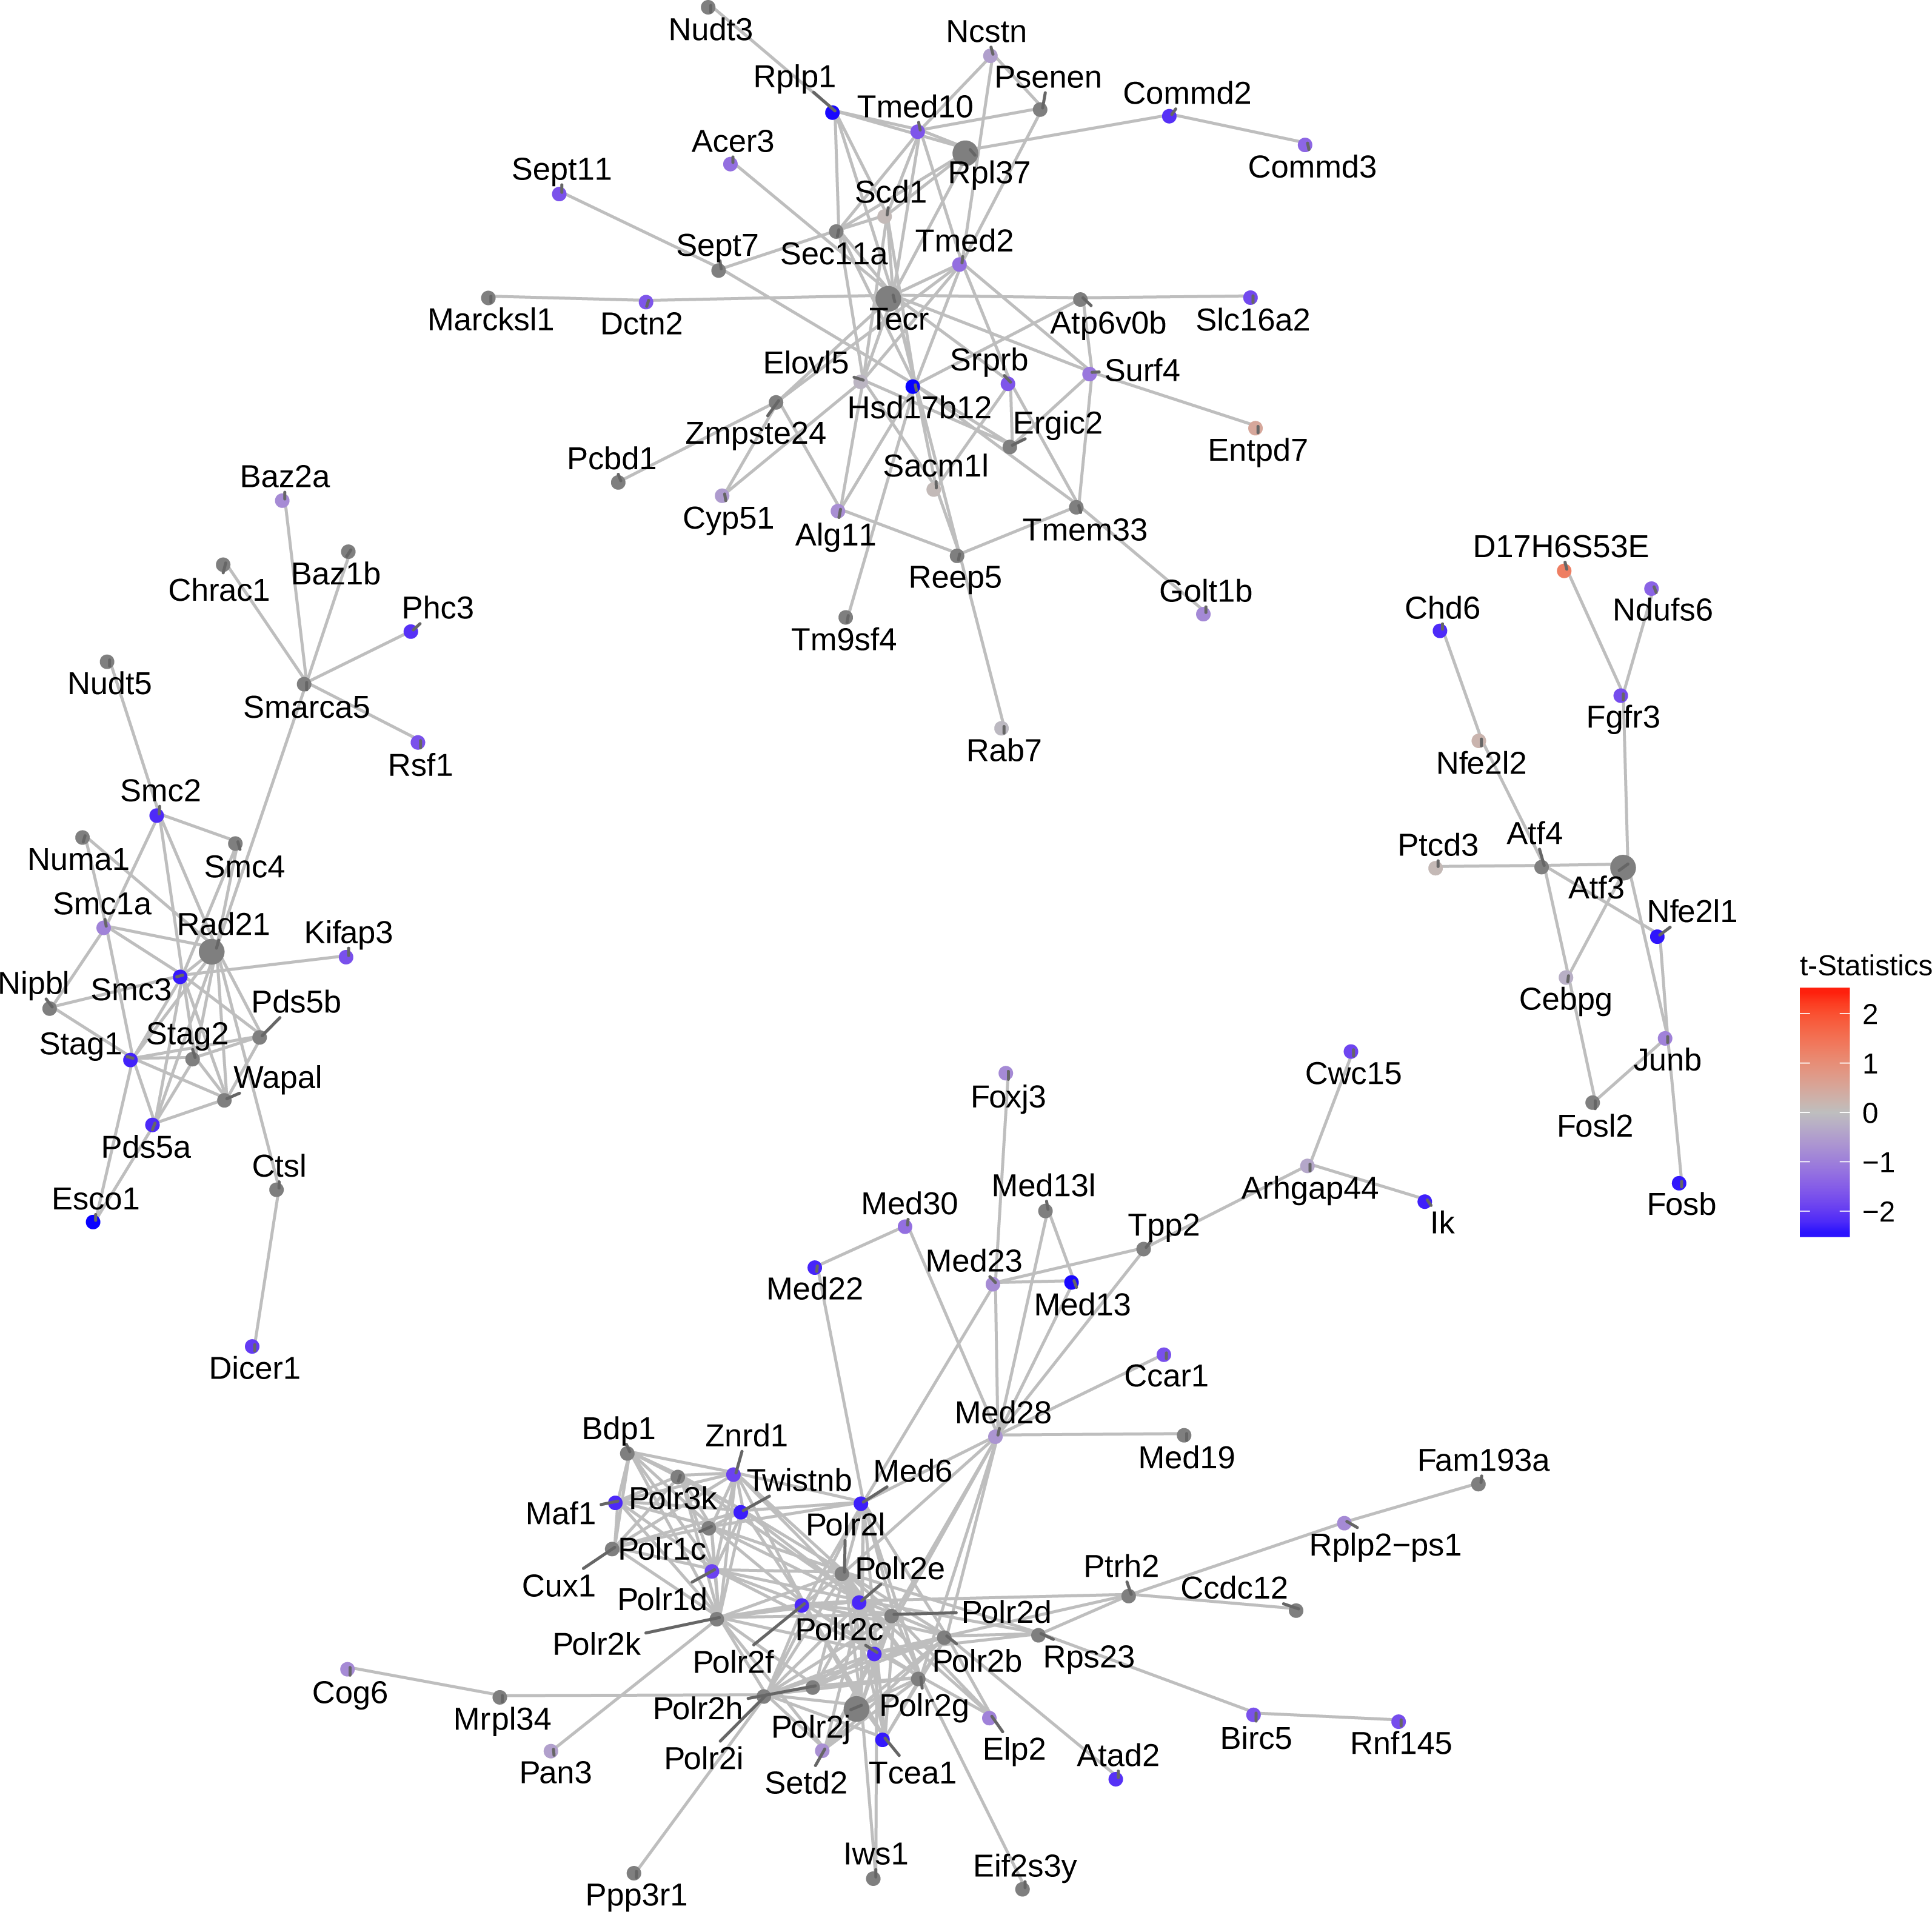 Detecting heterogeneity in single-cell RNA-Seq data by non